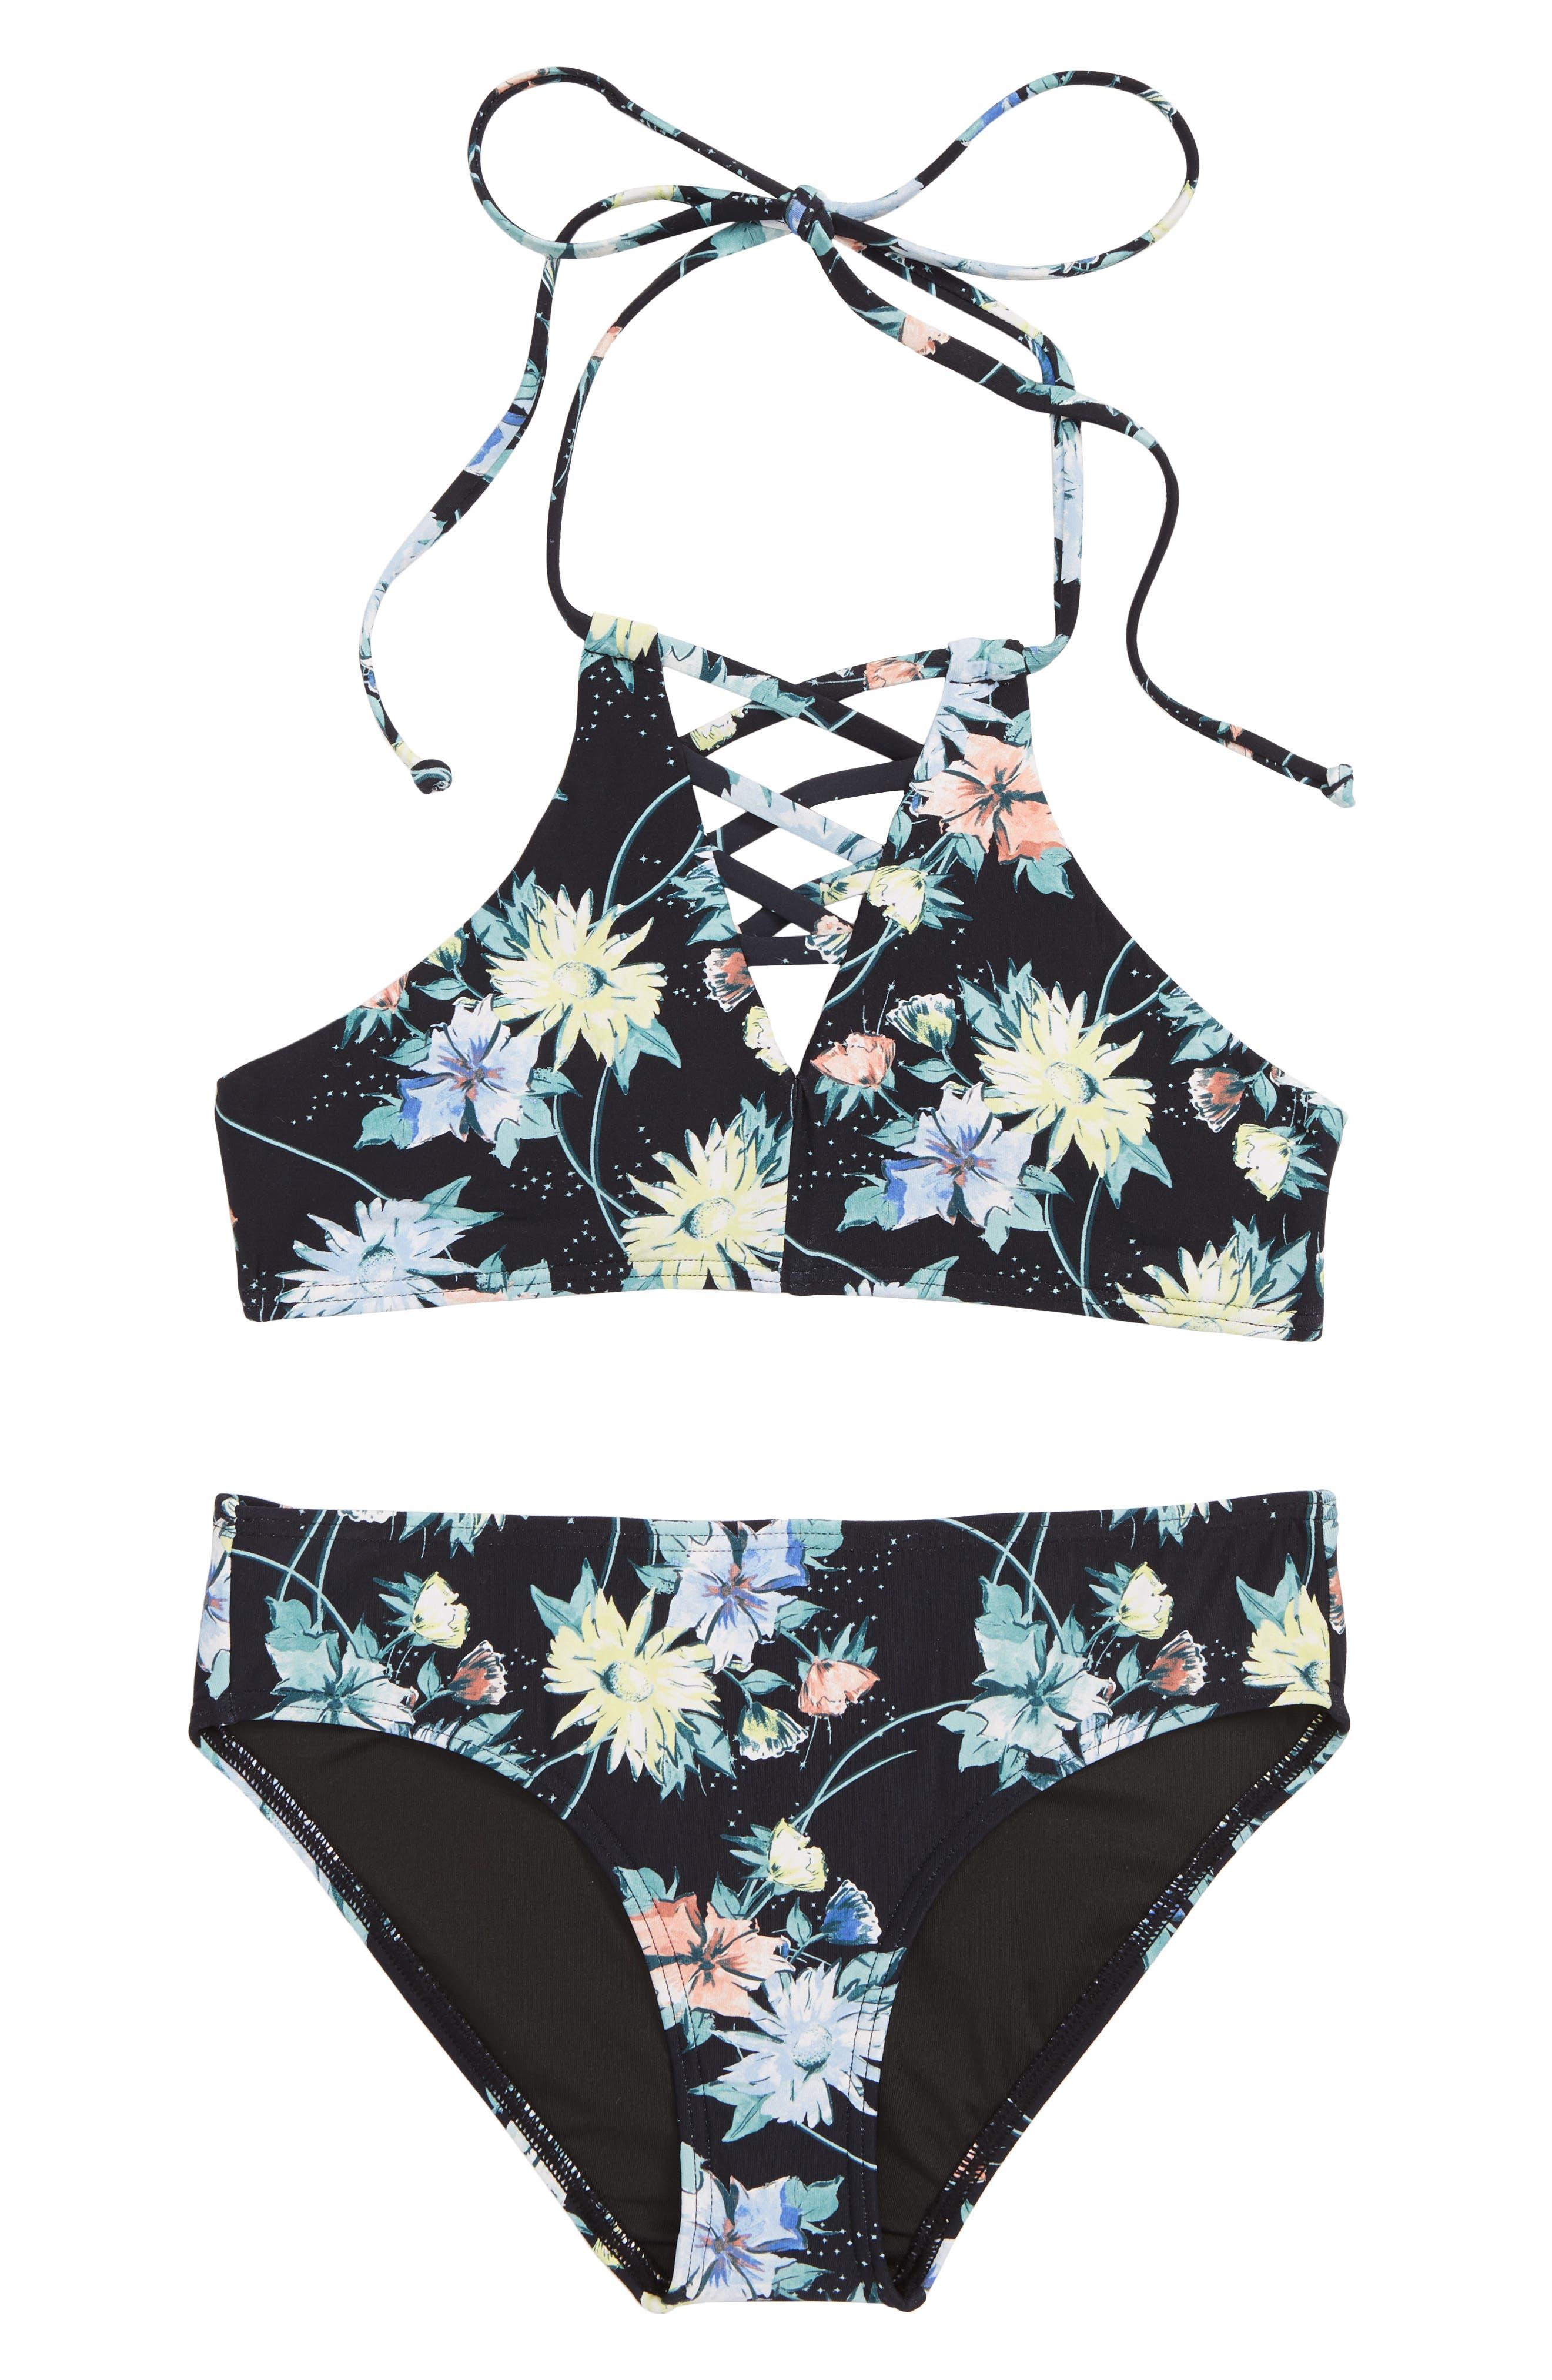 O'NEILL Dahlia Floral Two-Piece Swimsuit, Main, color, BLACK